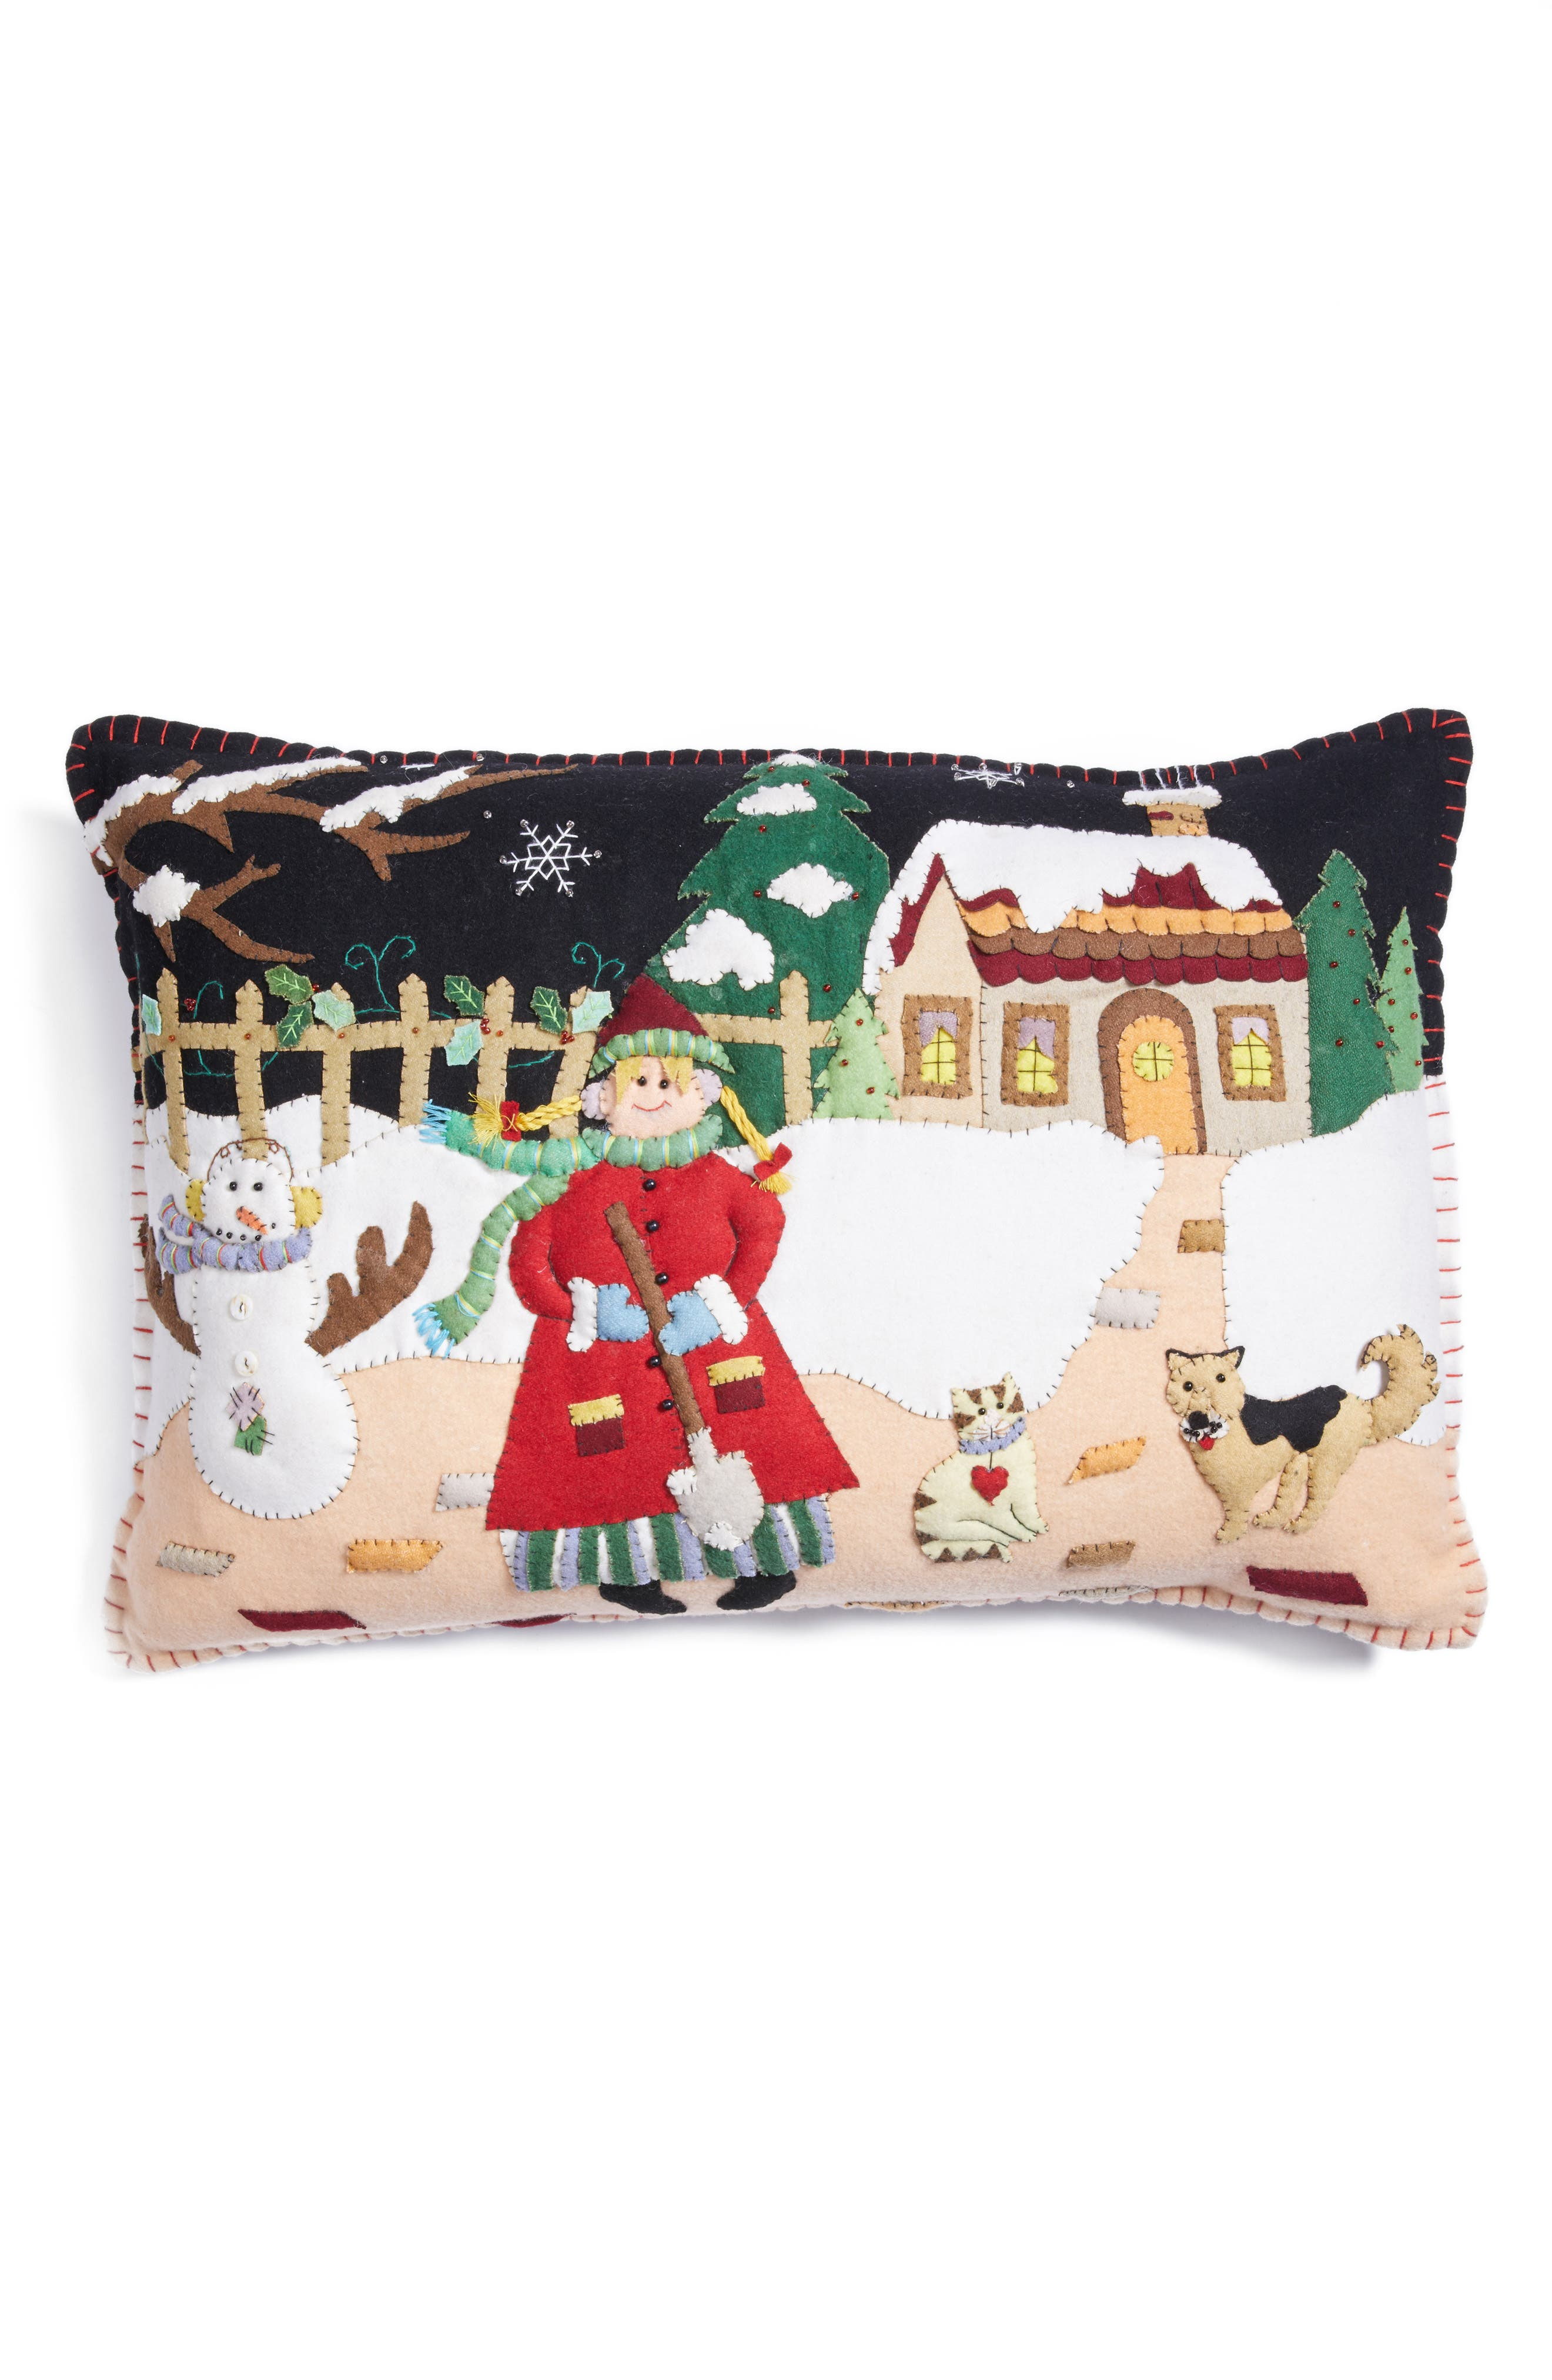 New World Arts Snow Day Pillow